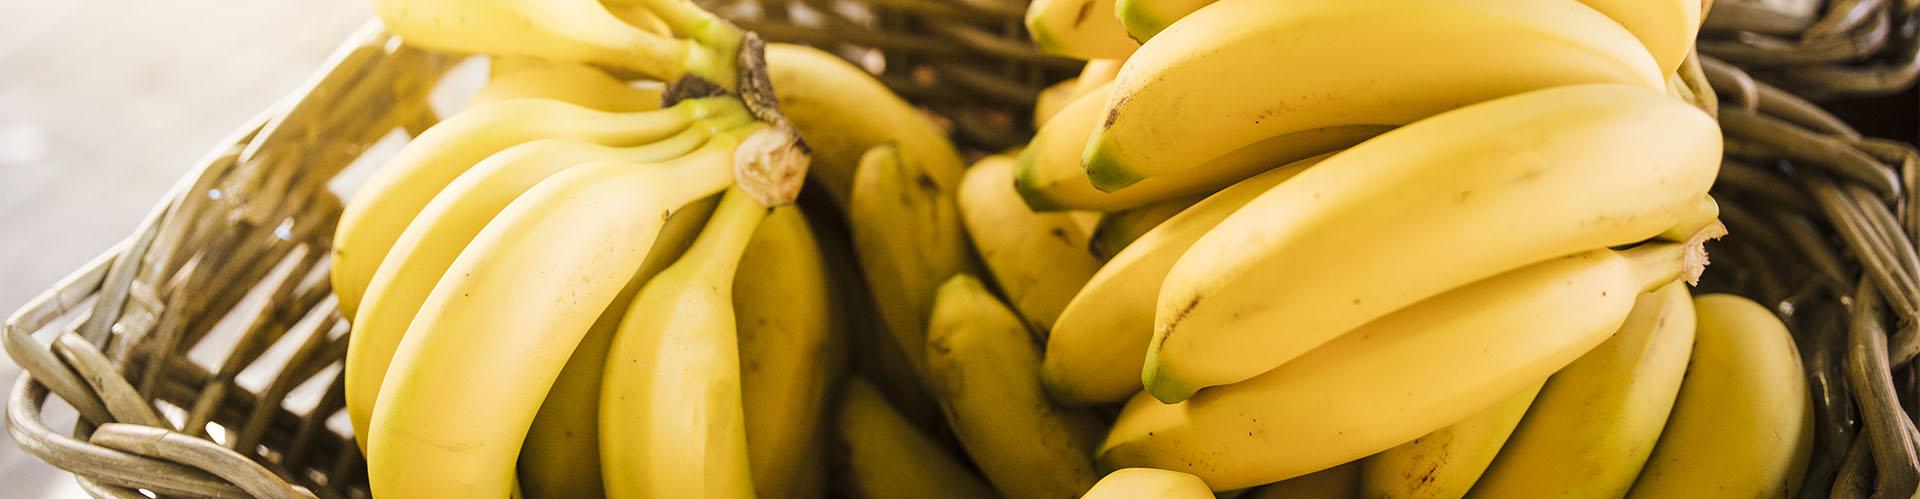 Os benefícios da banana para a saúde